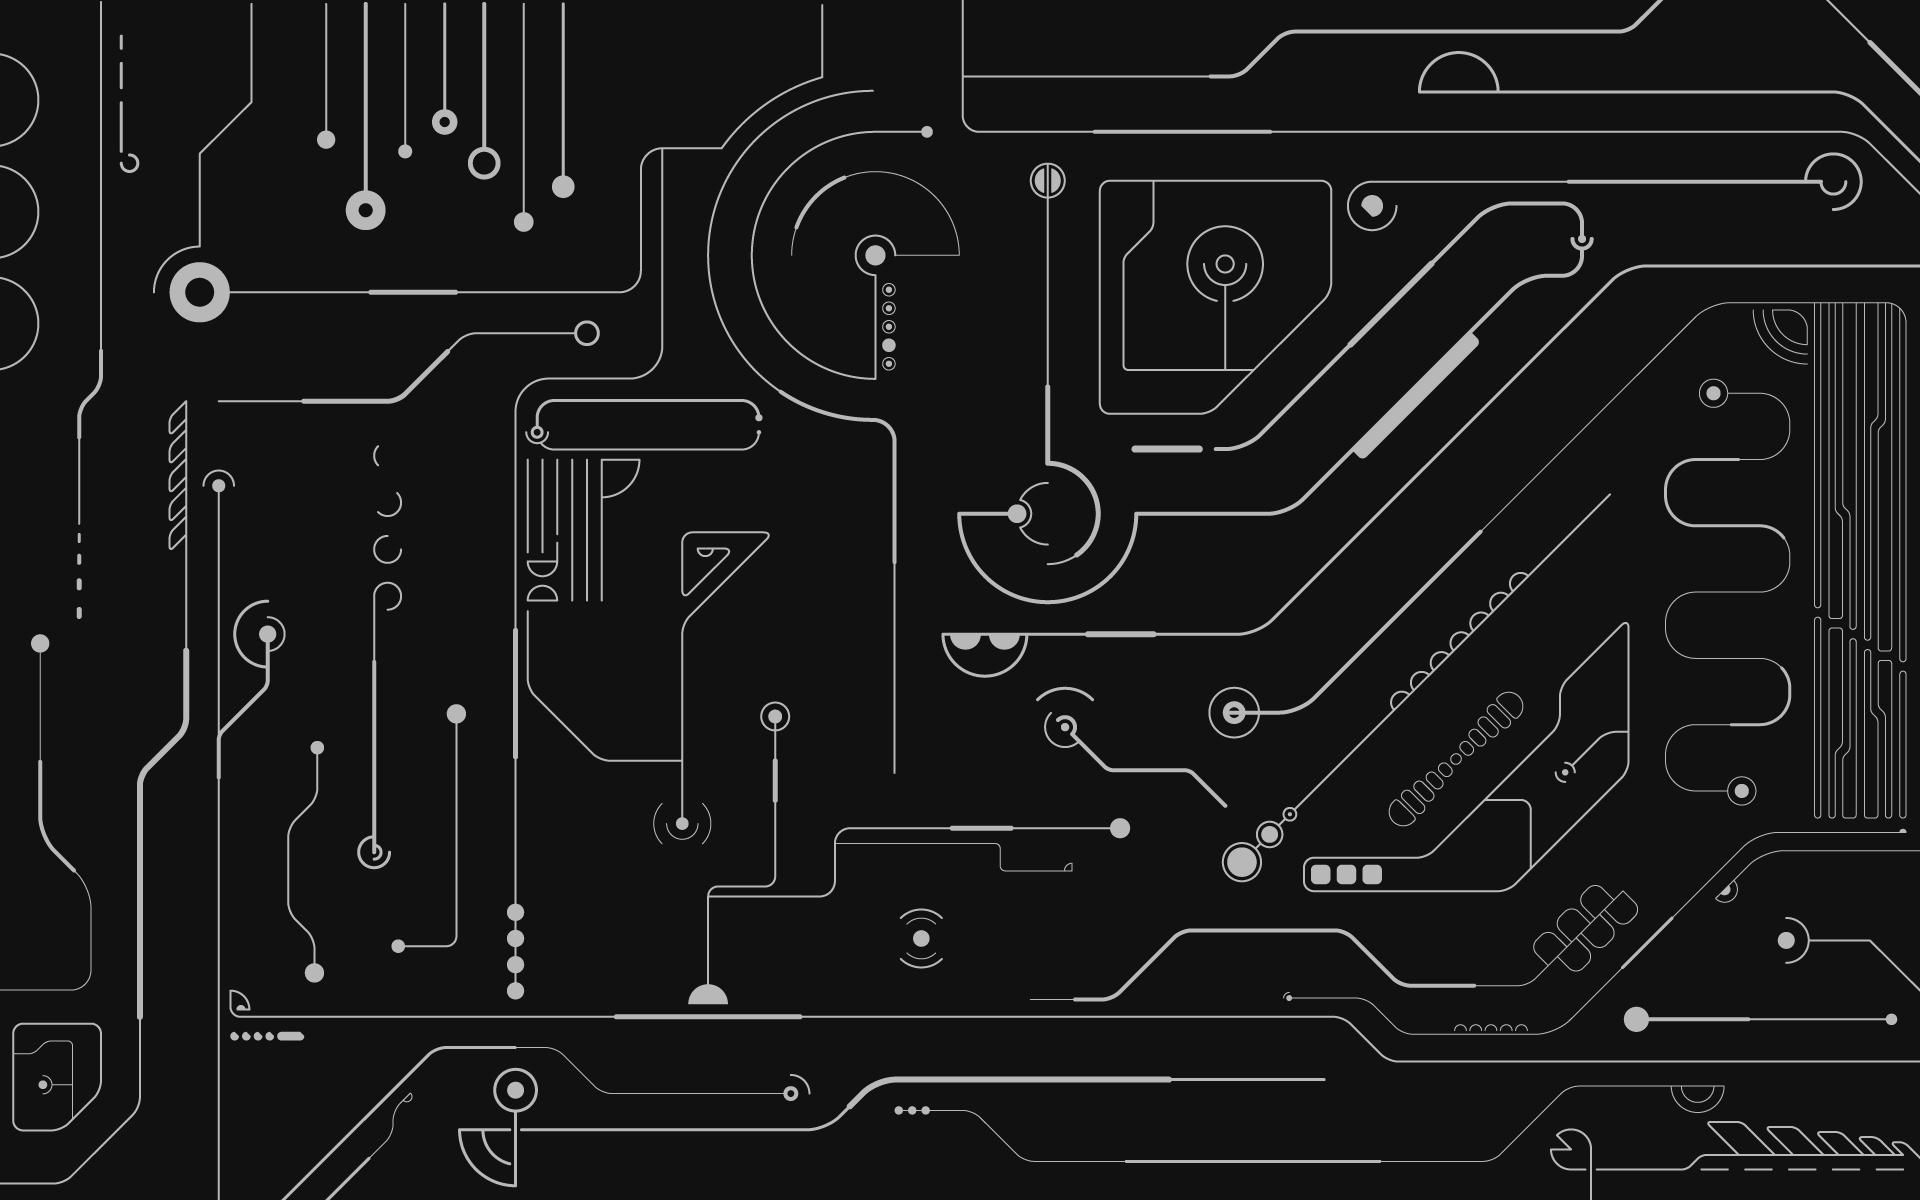 Unduh 800 Wallpaper Black Technology  Gratis